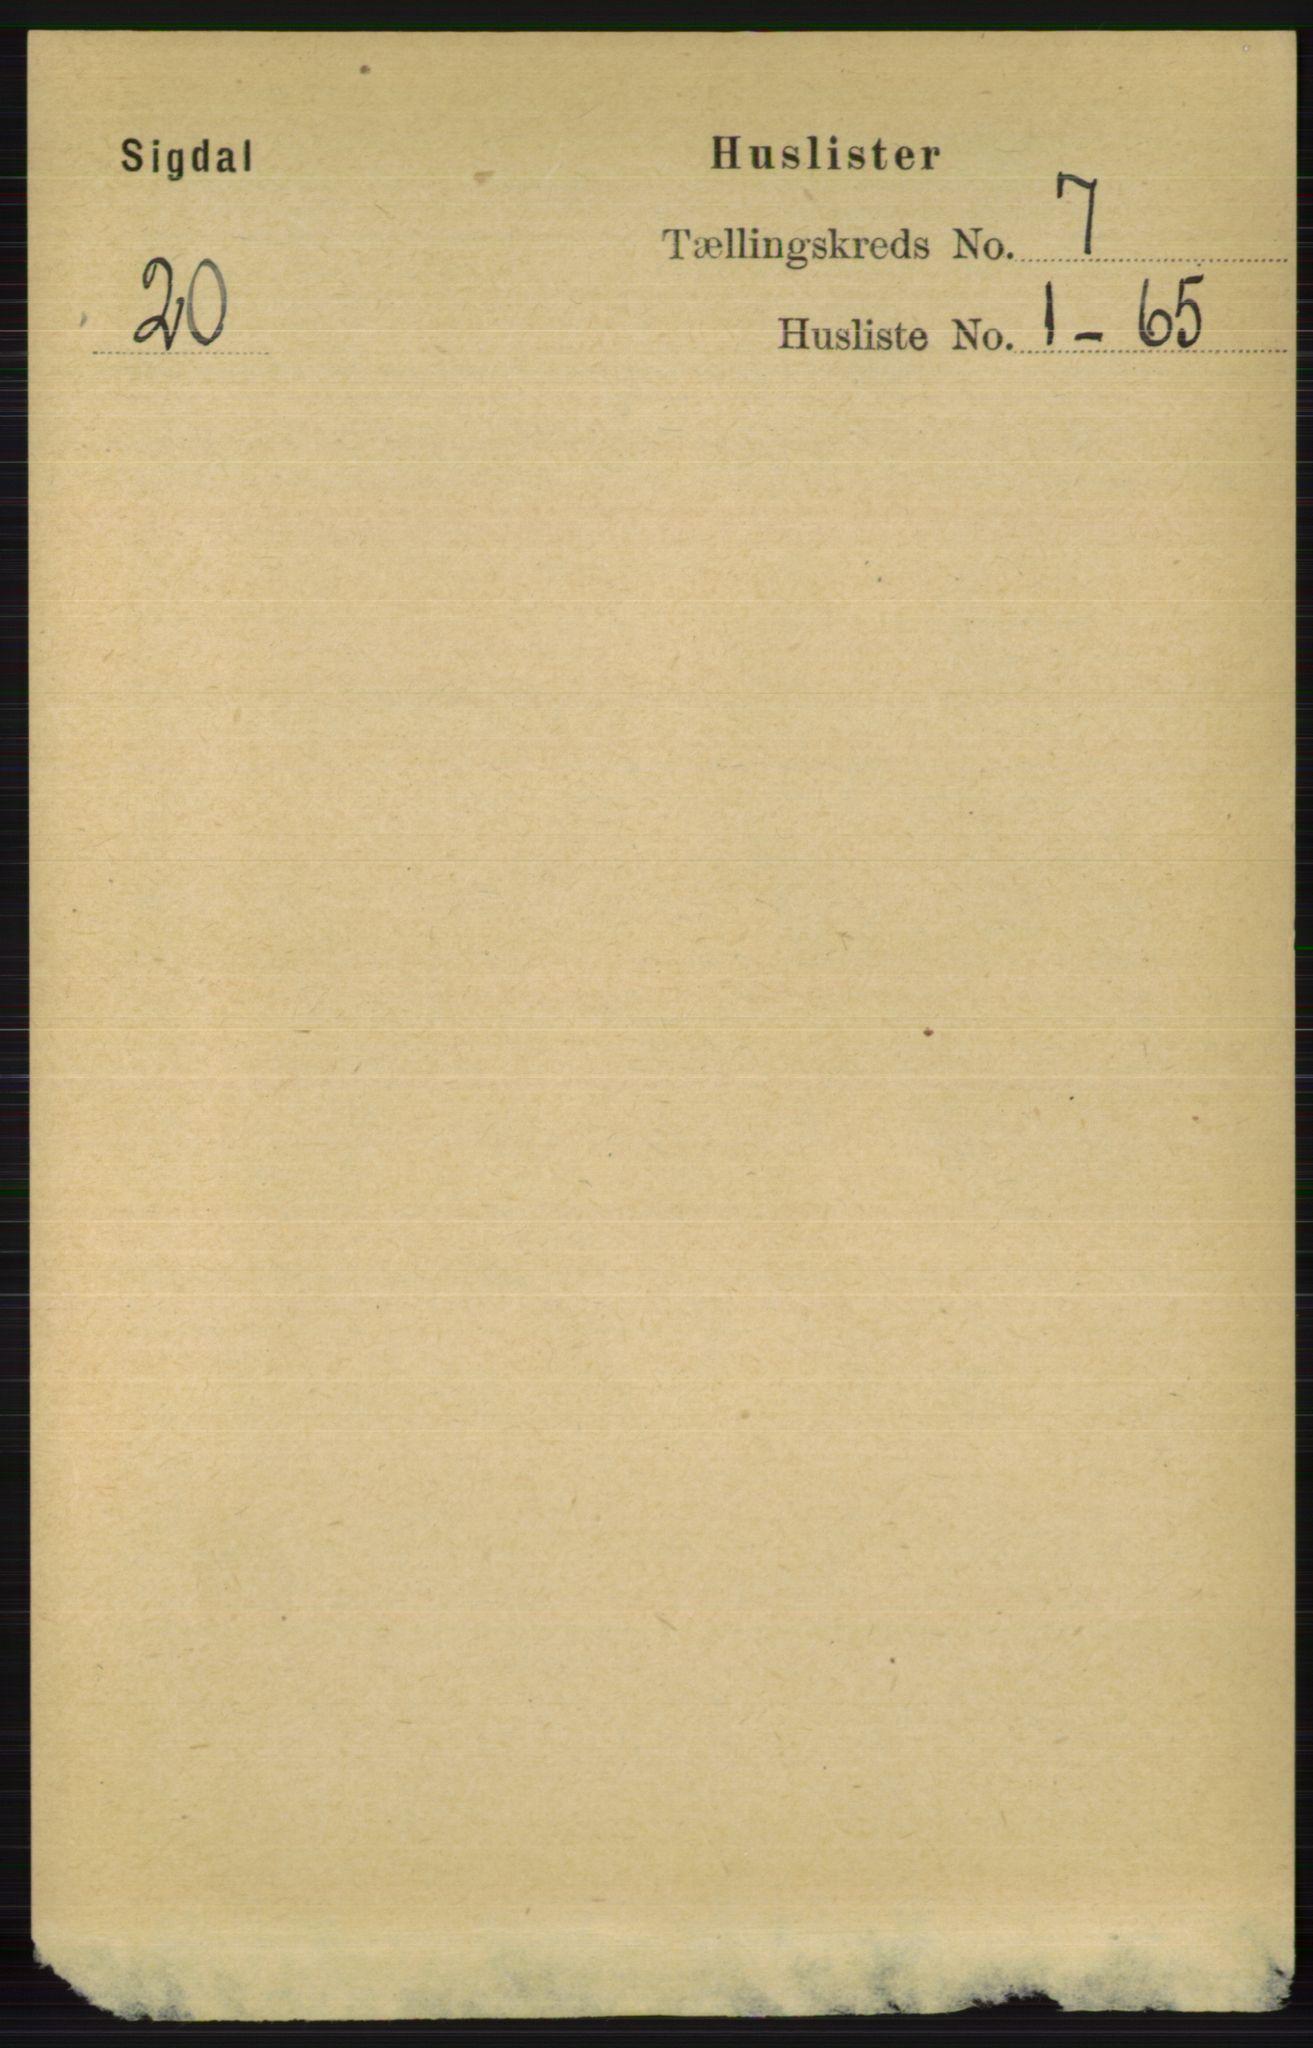 RA, Folketelling 1891 for 0621 Sigdal herred, 1891, s. 2649